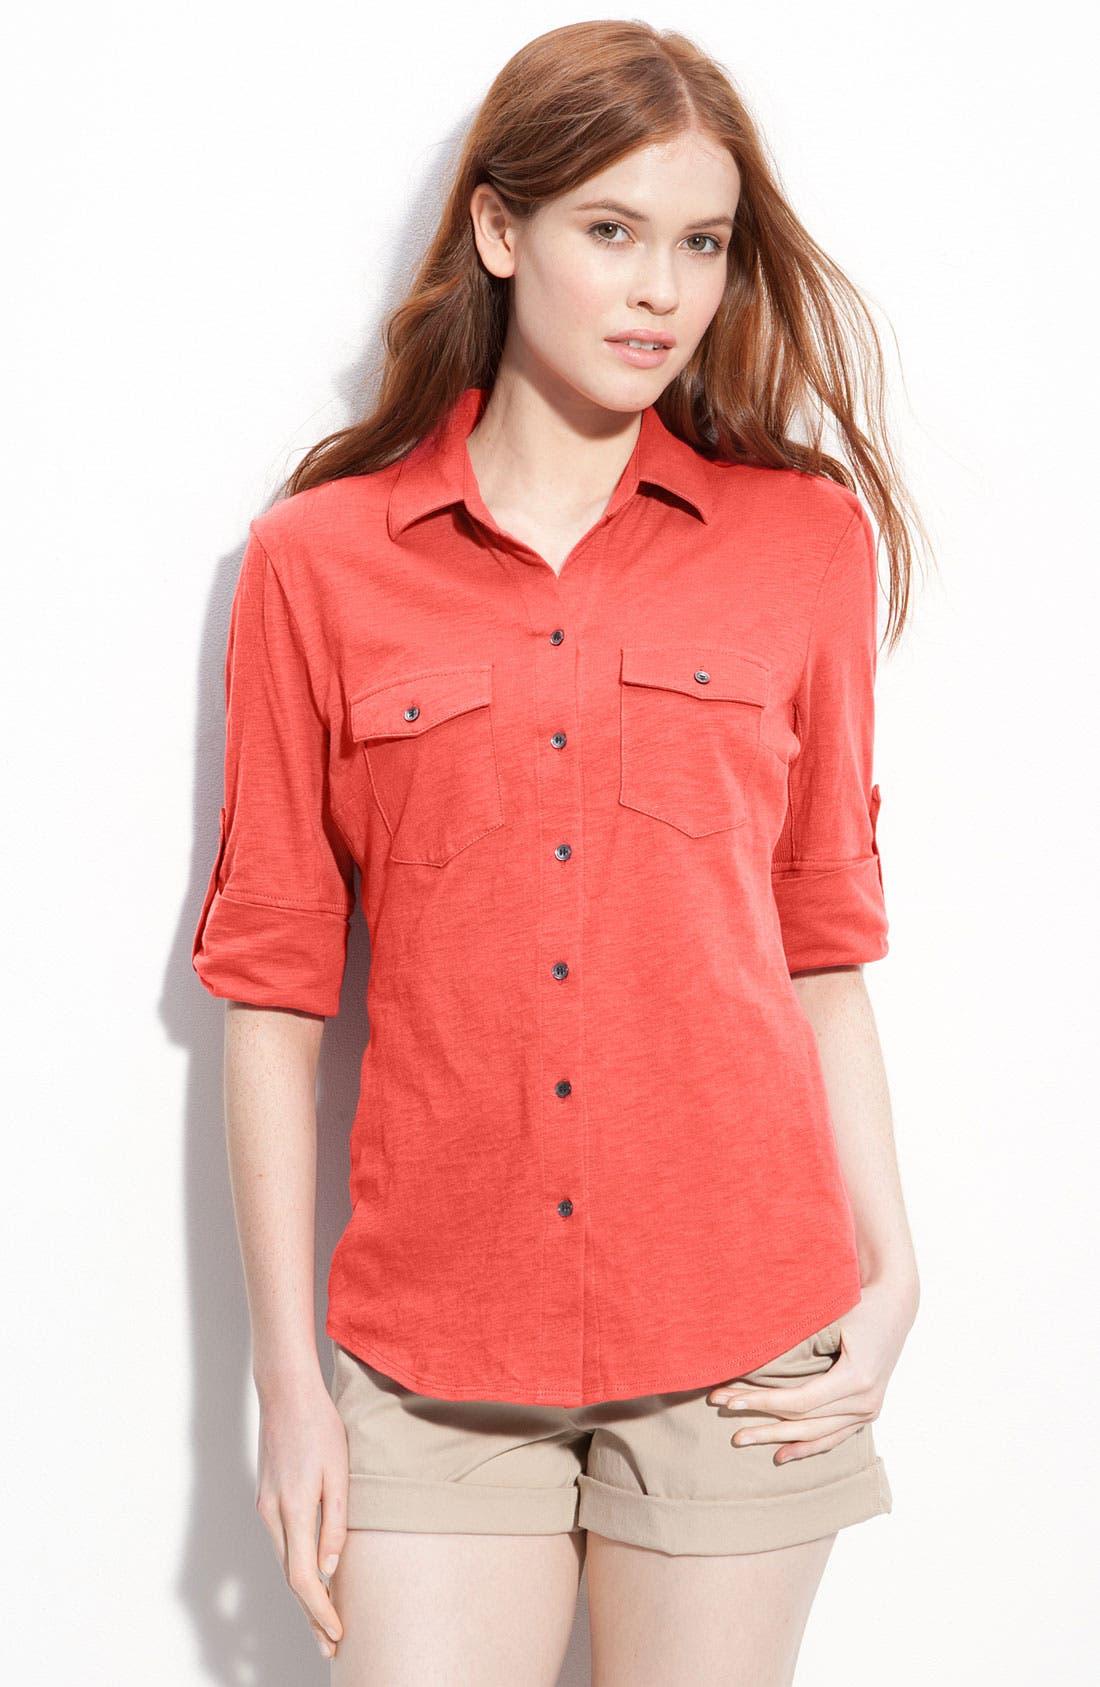 Alternate Image 1 Selected - Sandra Three Quarter Roll Sleeve Knit Shirt (Regular & Petite)